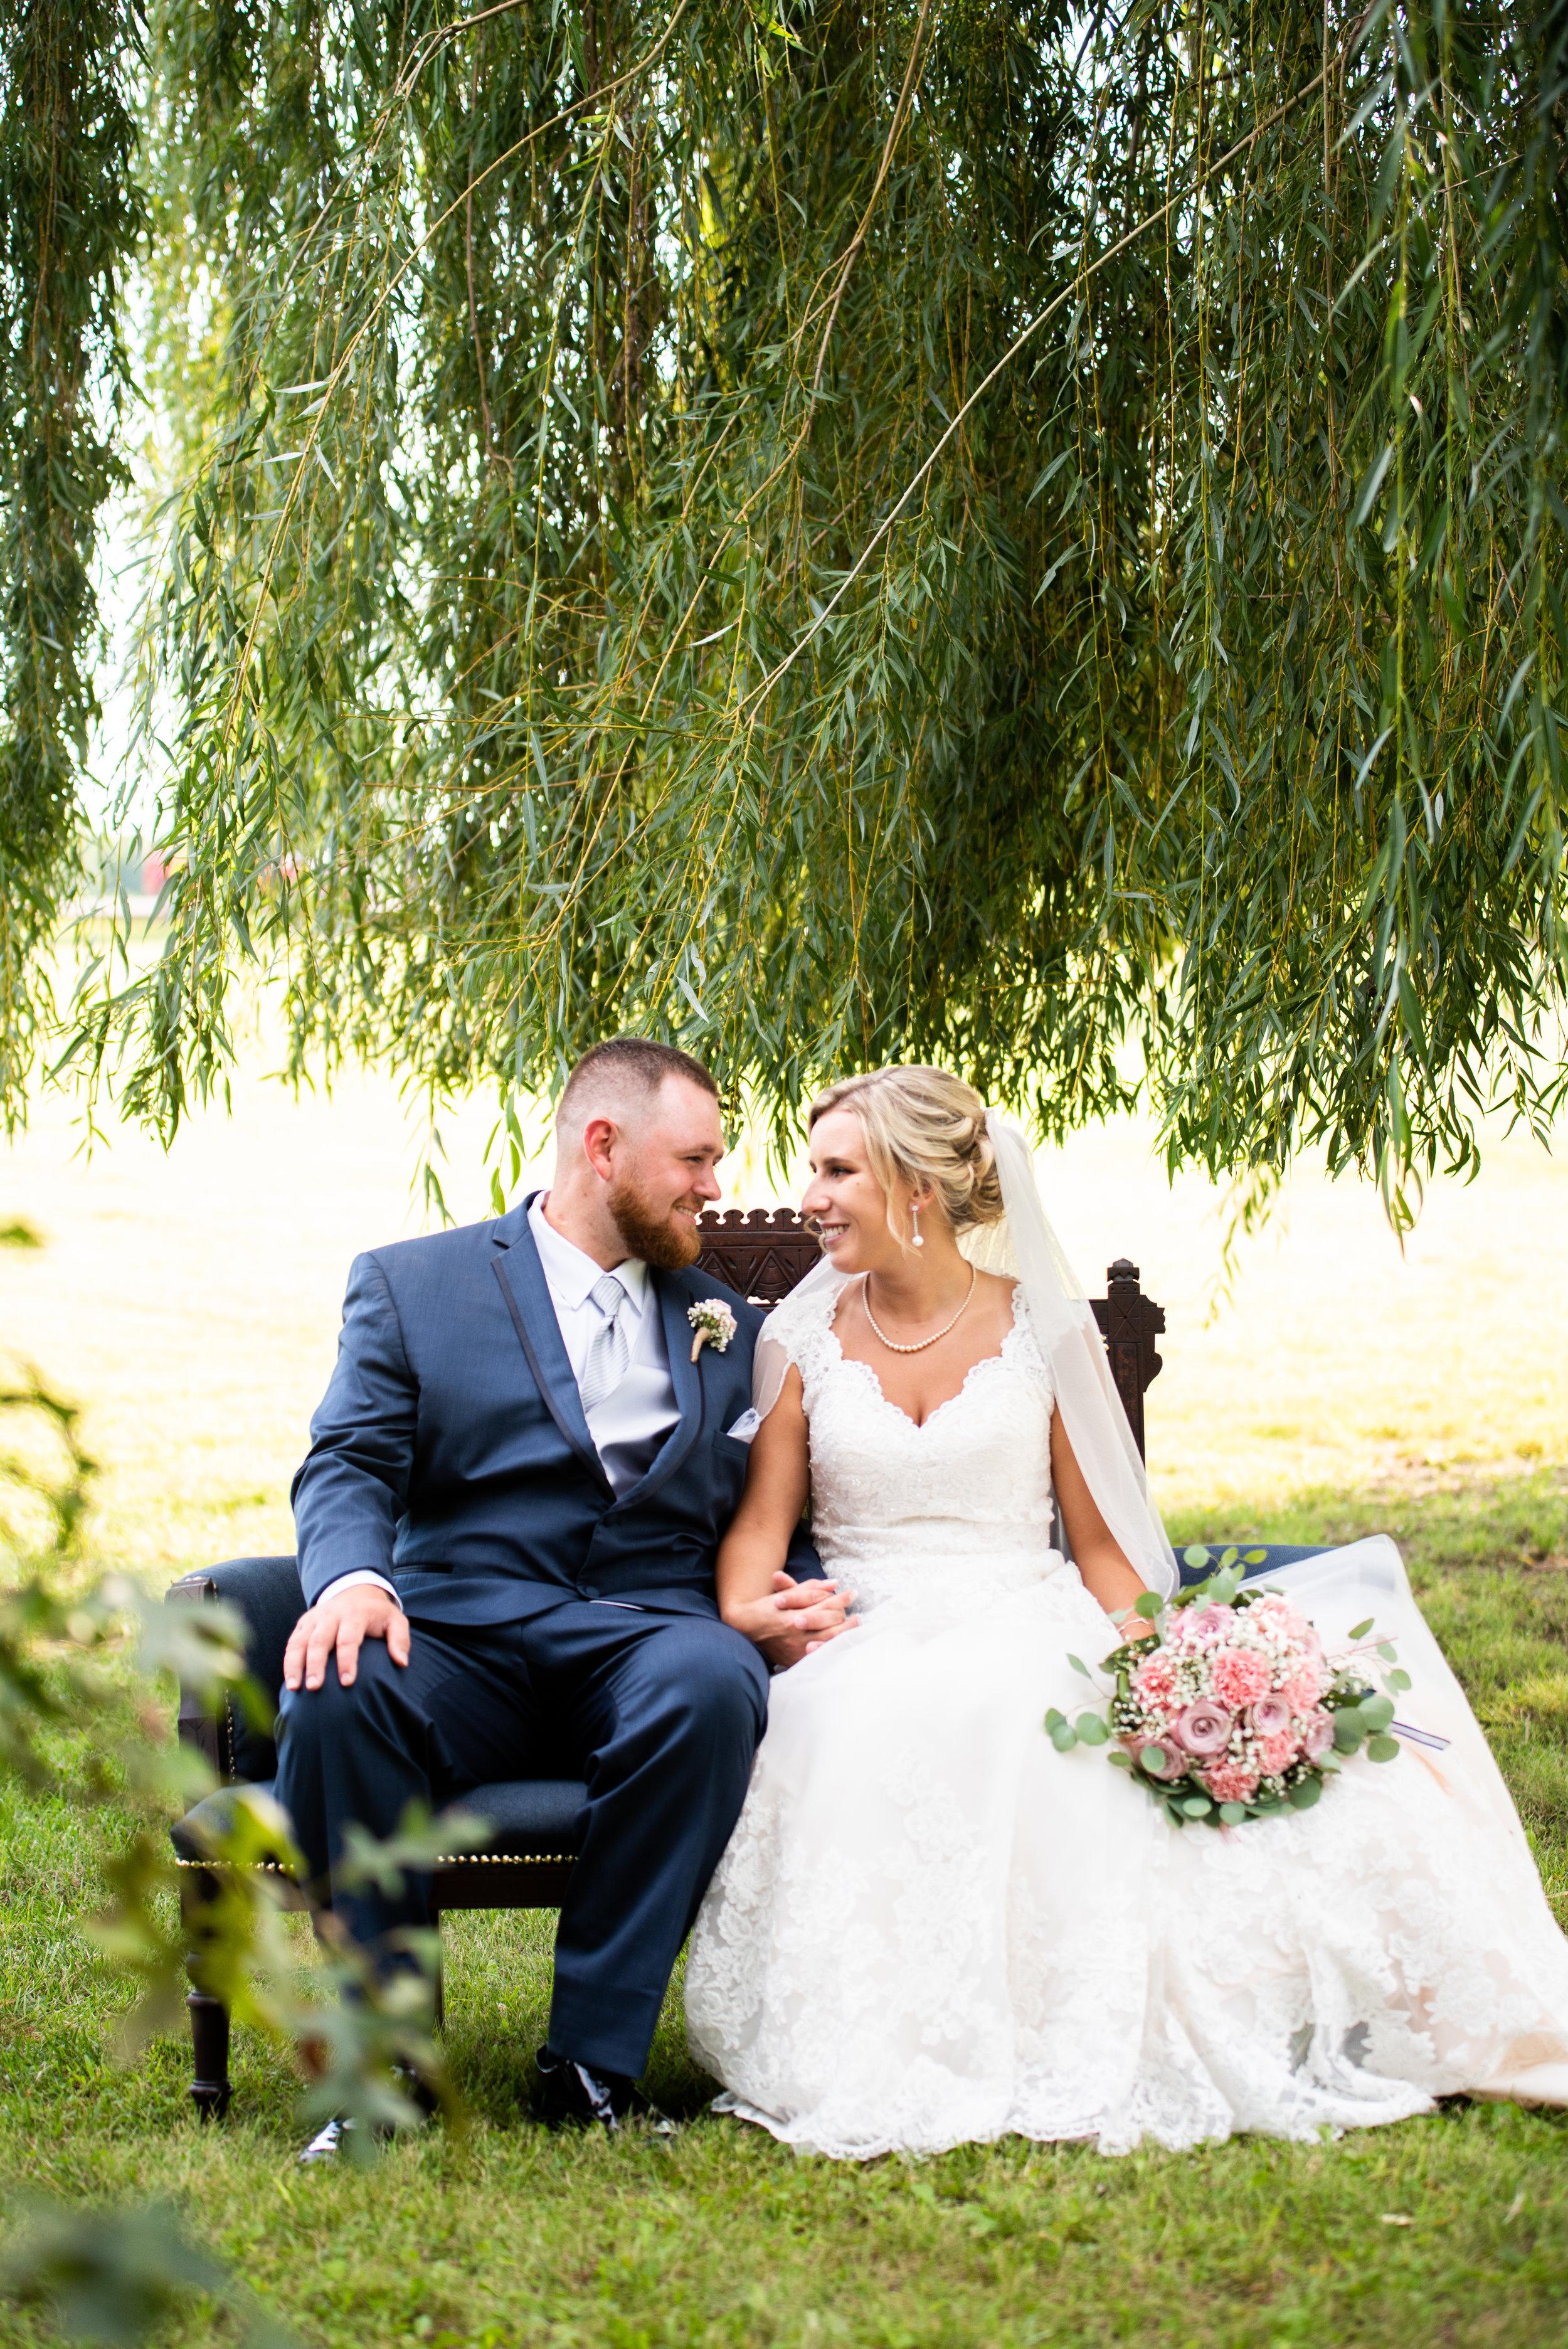 wedding (1 of 1)-137.jpg